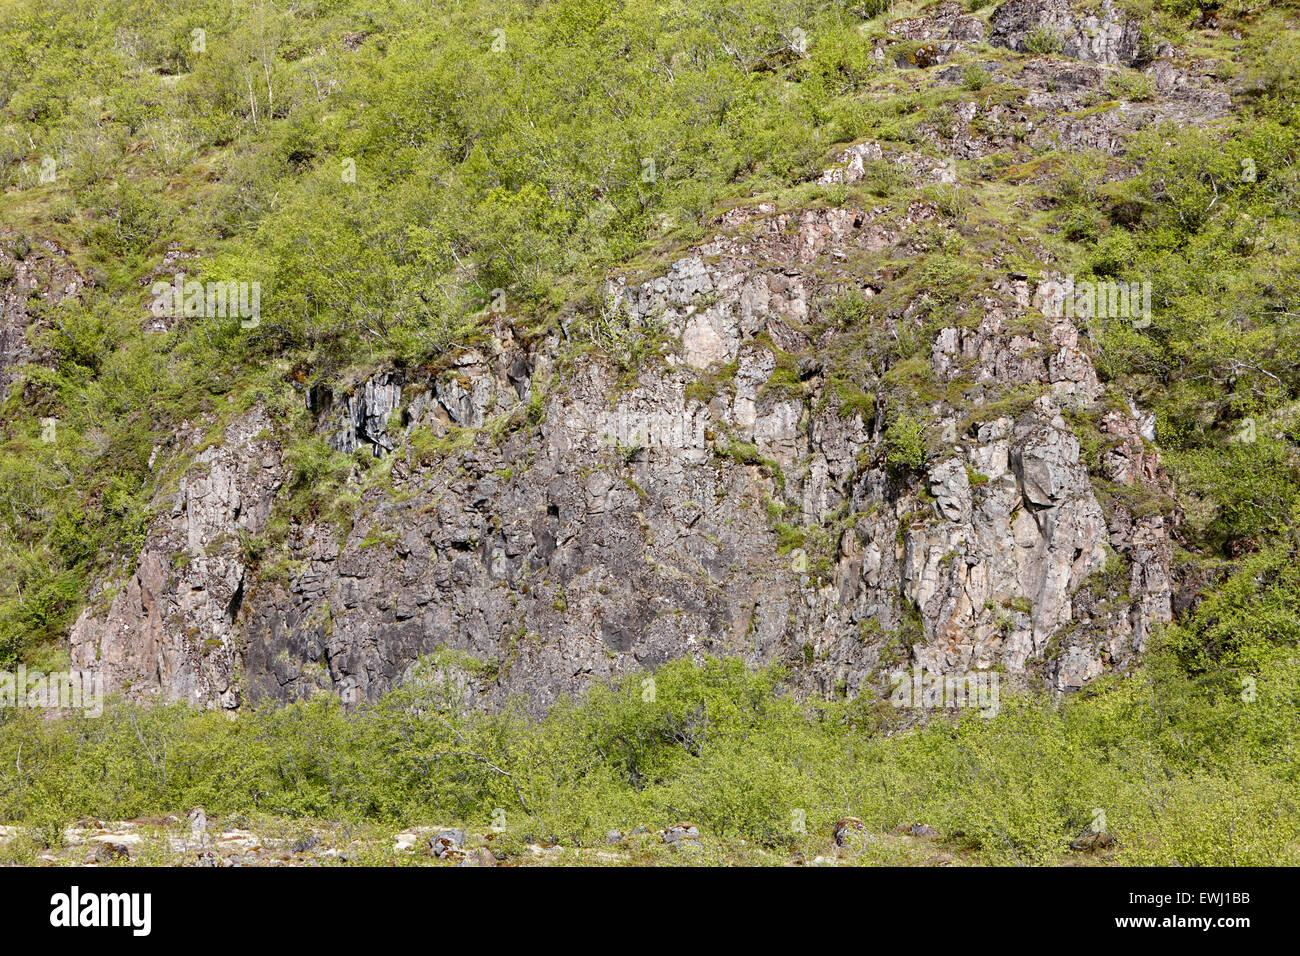 basalt dikes protruding from hillside Iceland - Stock Image